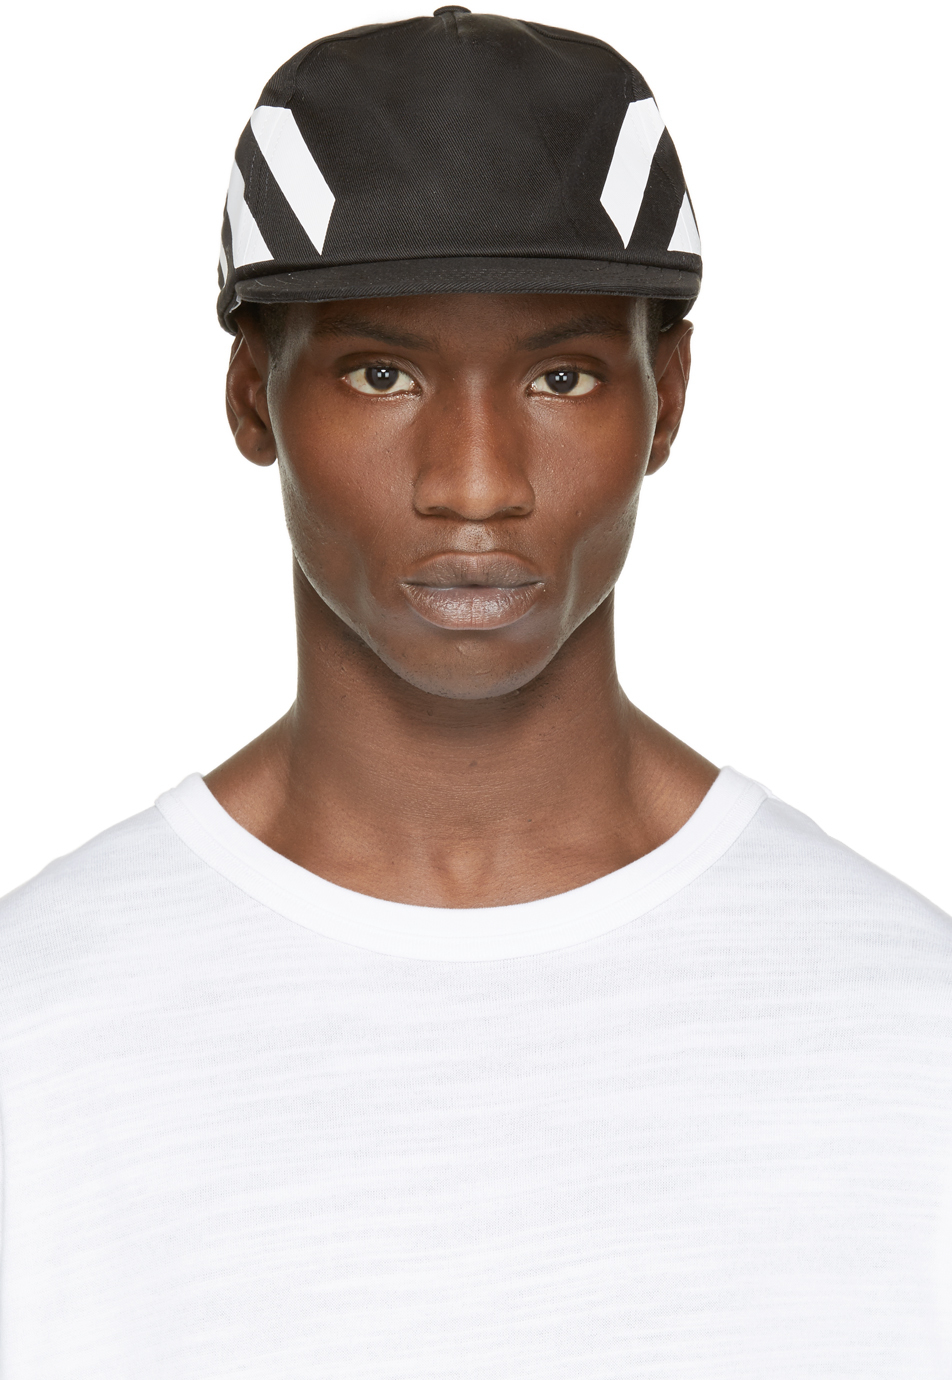 77462519 Off-White c/o Virgil Abloh Black Stripe Cap in Black for Men - Lyst